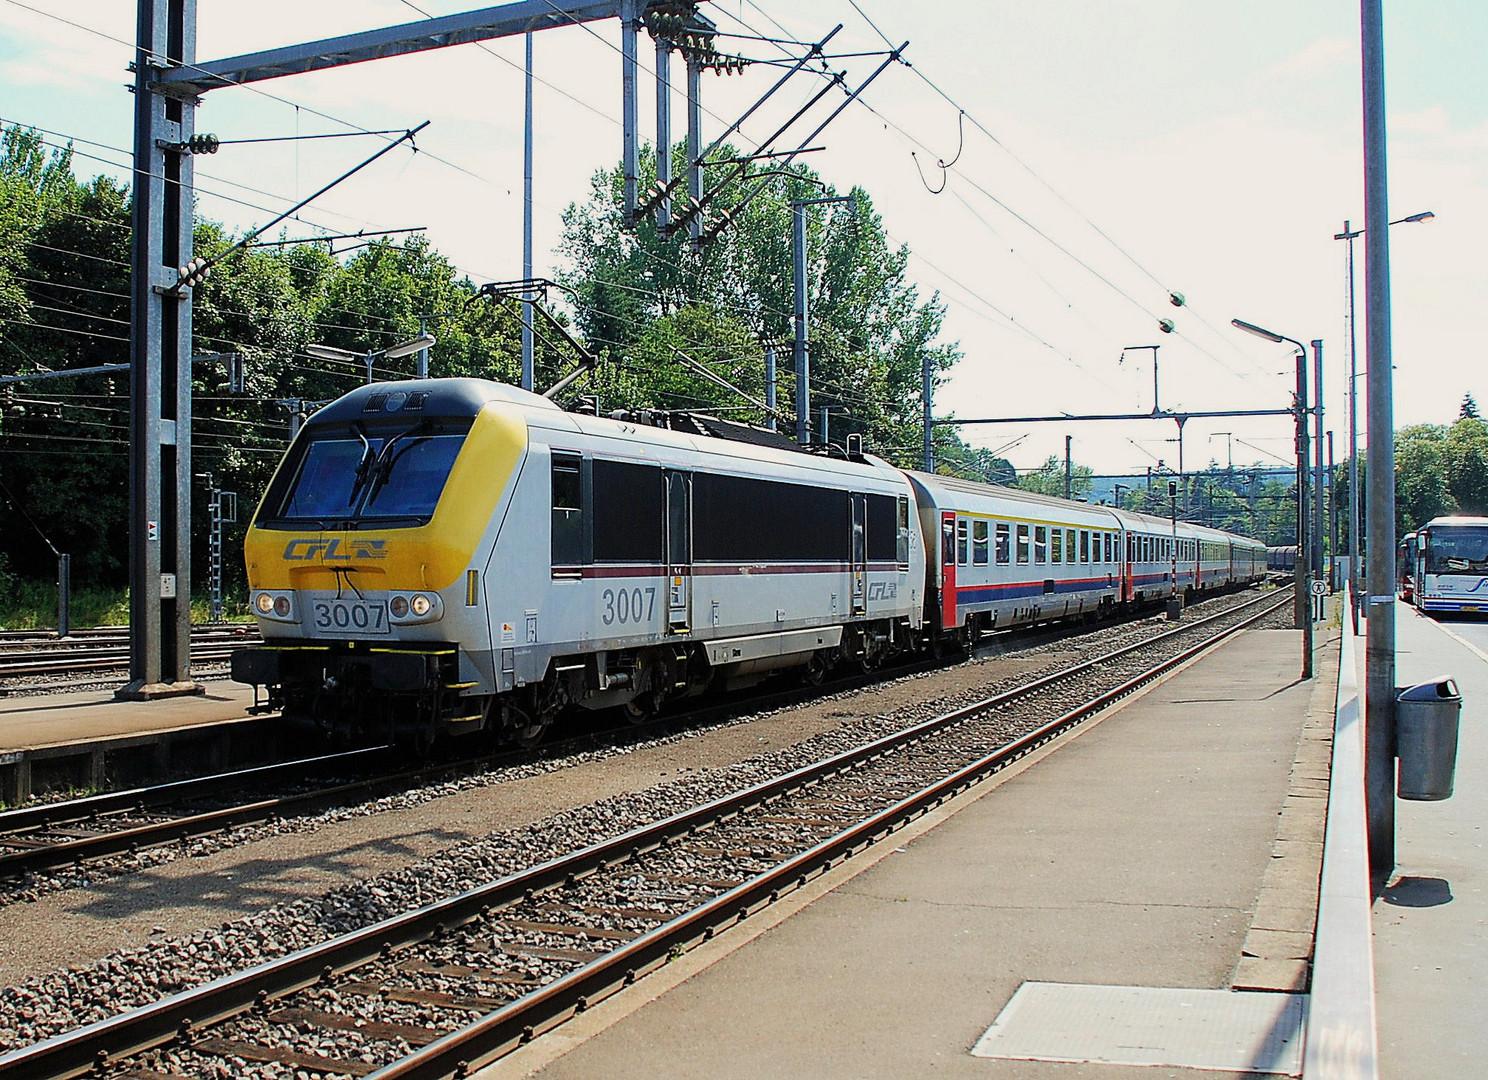 CFL-3007